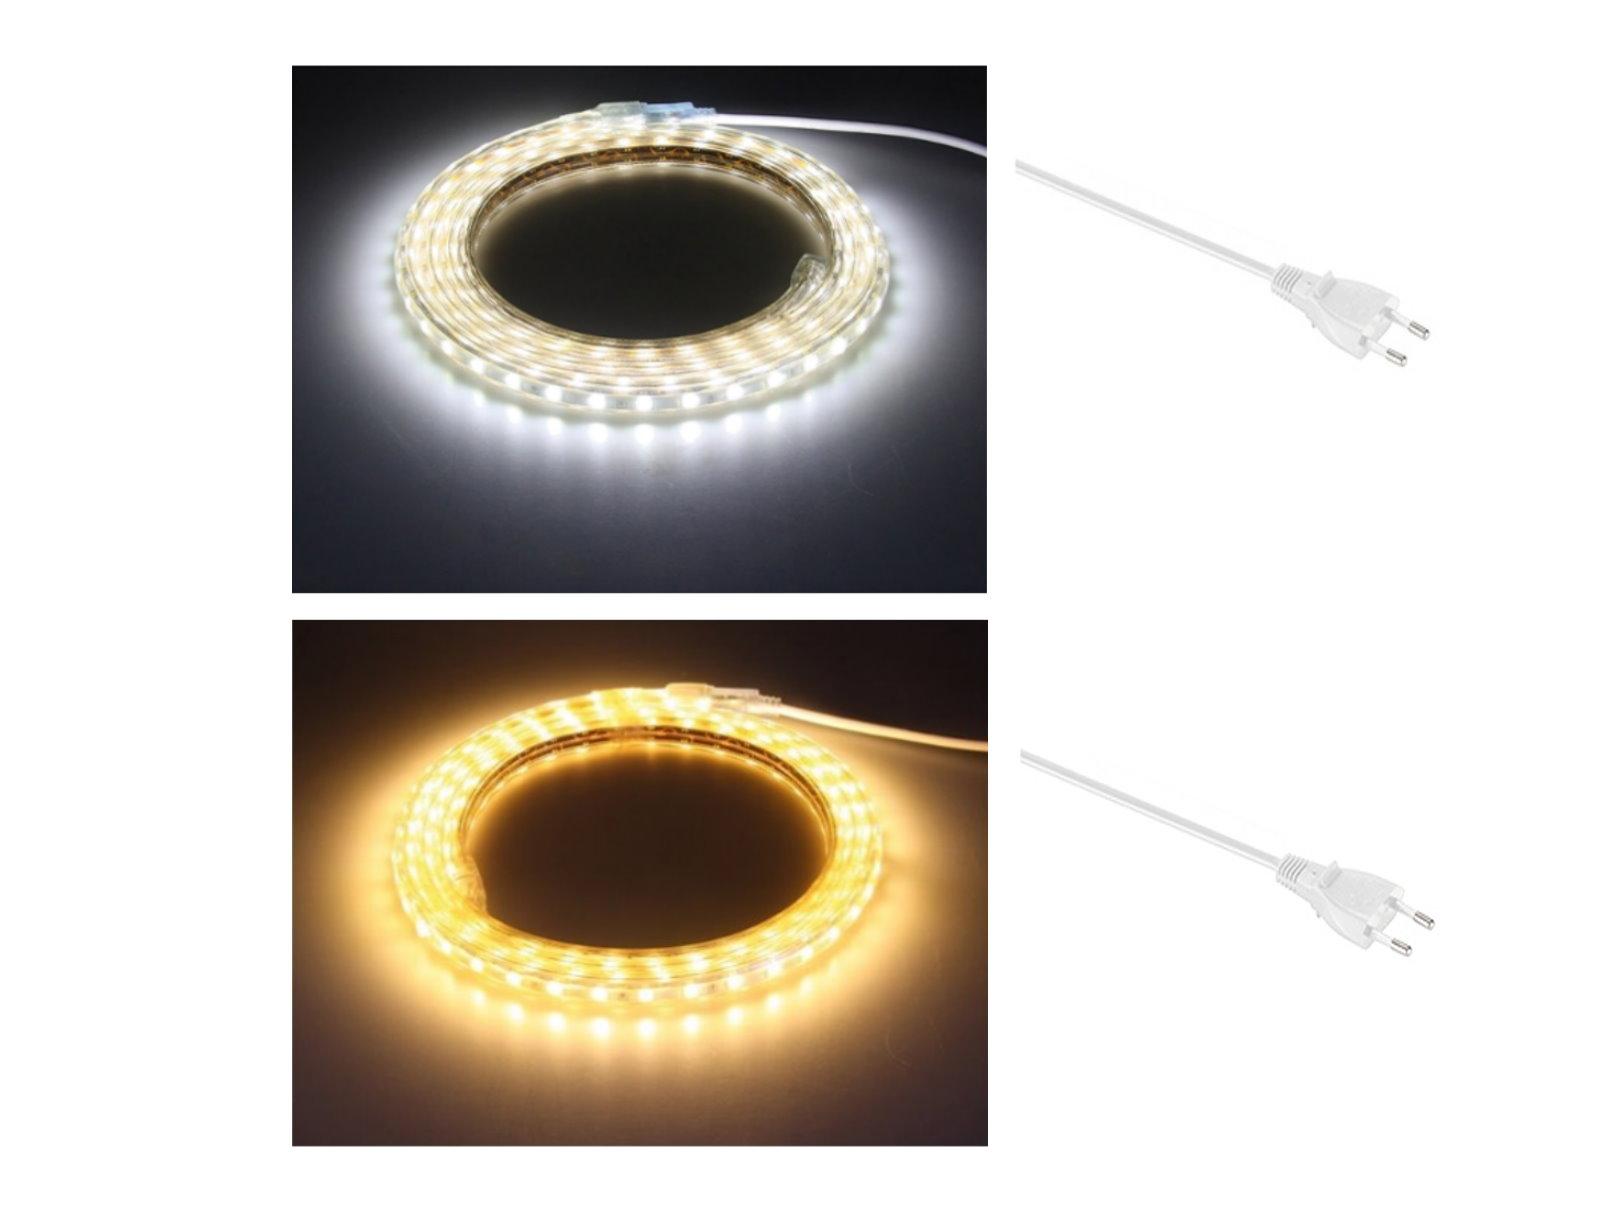 led lichtband 230v mit stecker dimmbar ip44. Black Bedroom Furniture Sets. Home Design Ideas